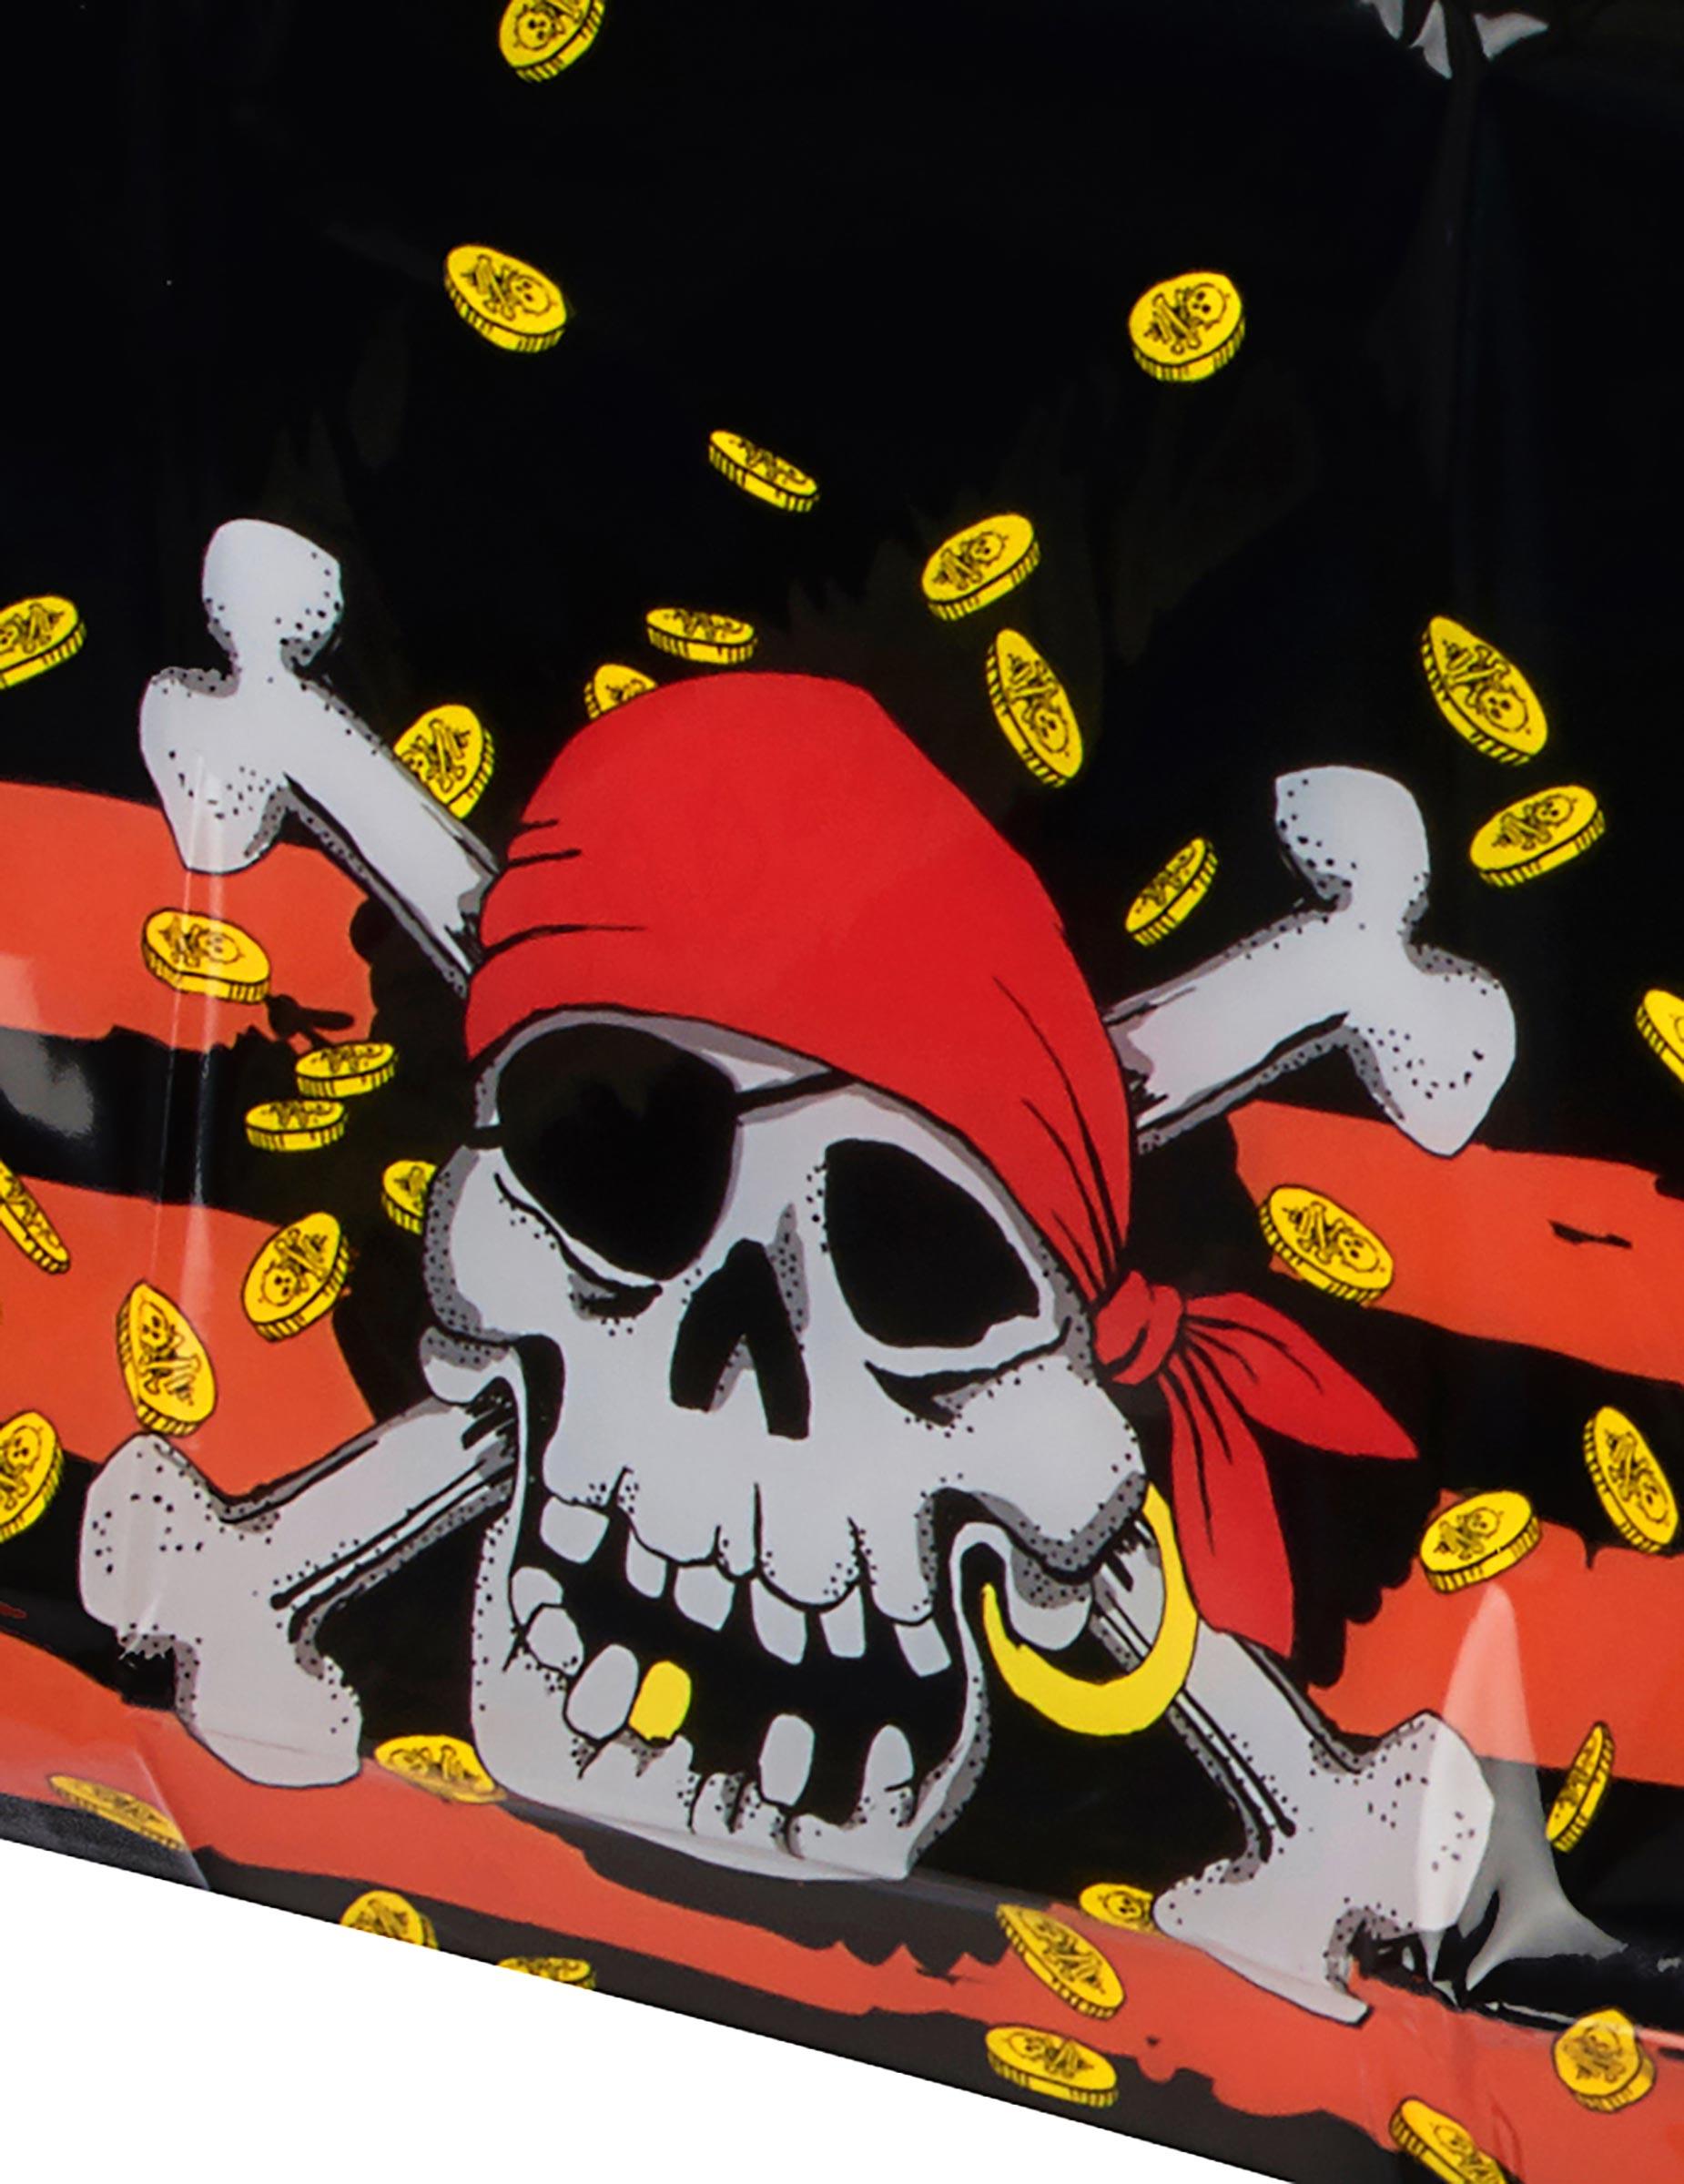 tischdecke totenkopf skull piratenparty deko rot schwarz. Black Bedroom Furniture Sets. Home Design Ideas